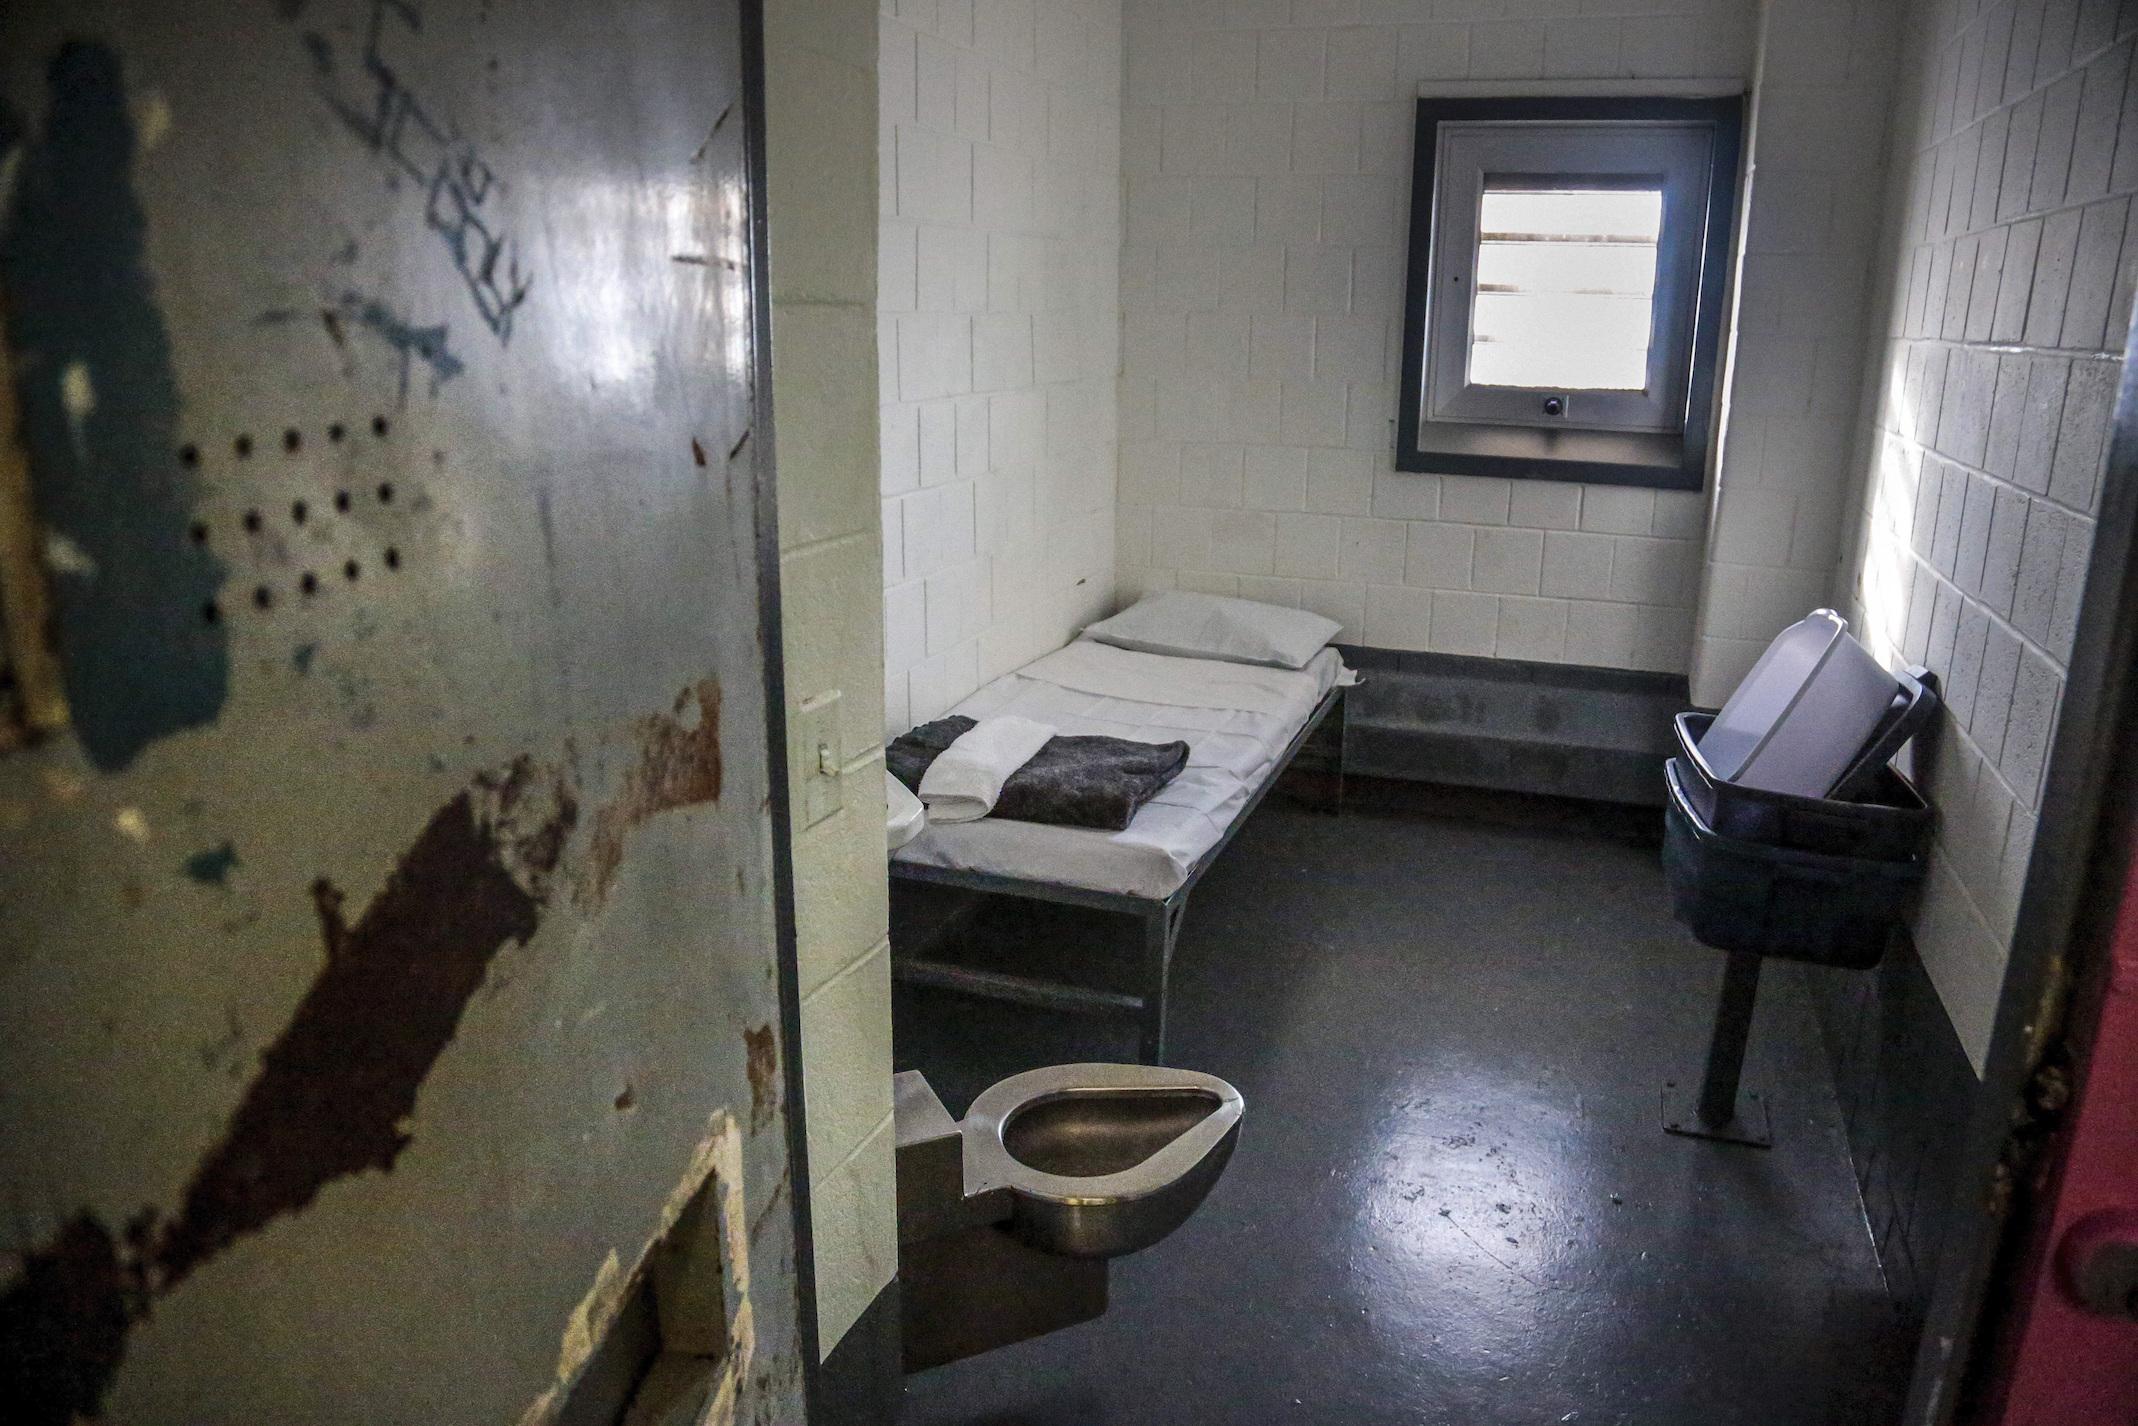 When Torture Is A Health Precaution